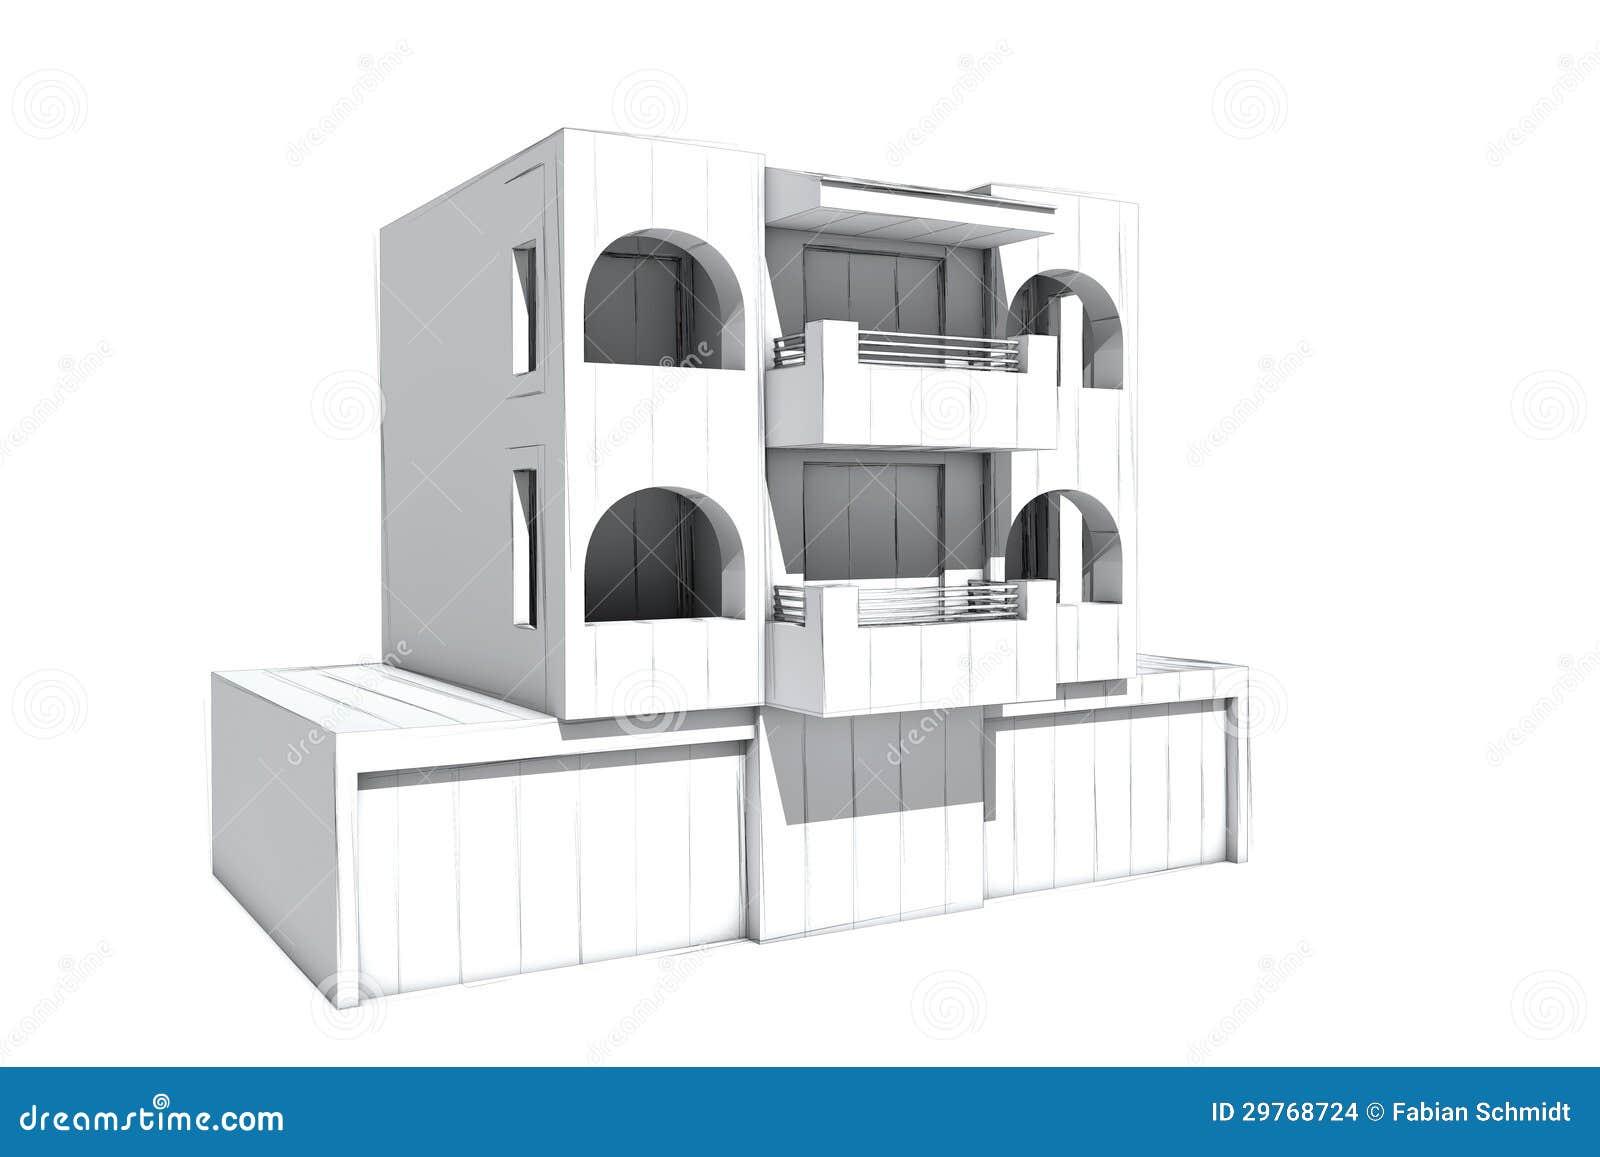 Architecturale visualisatie